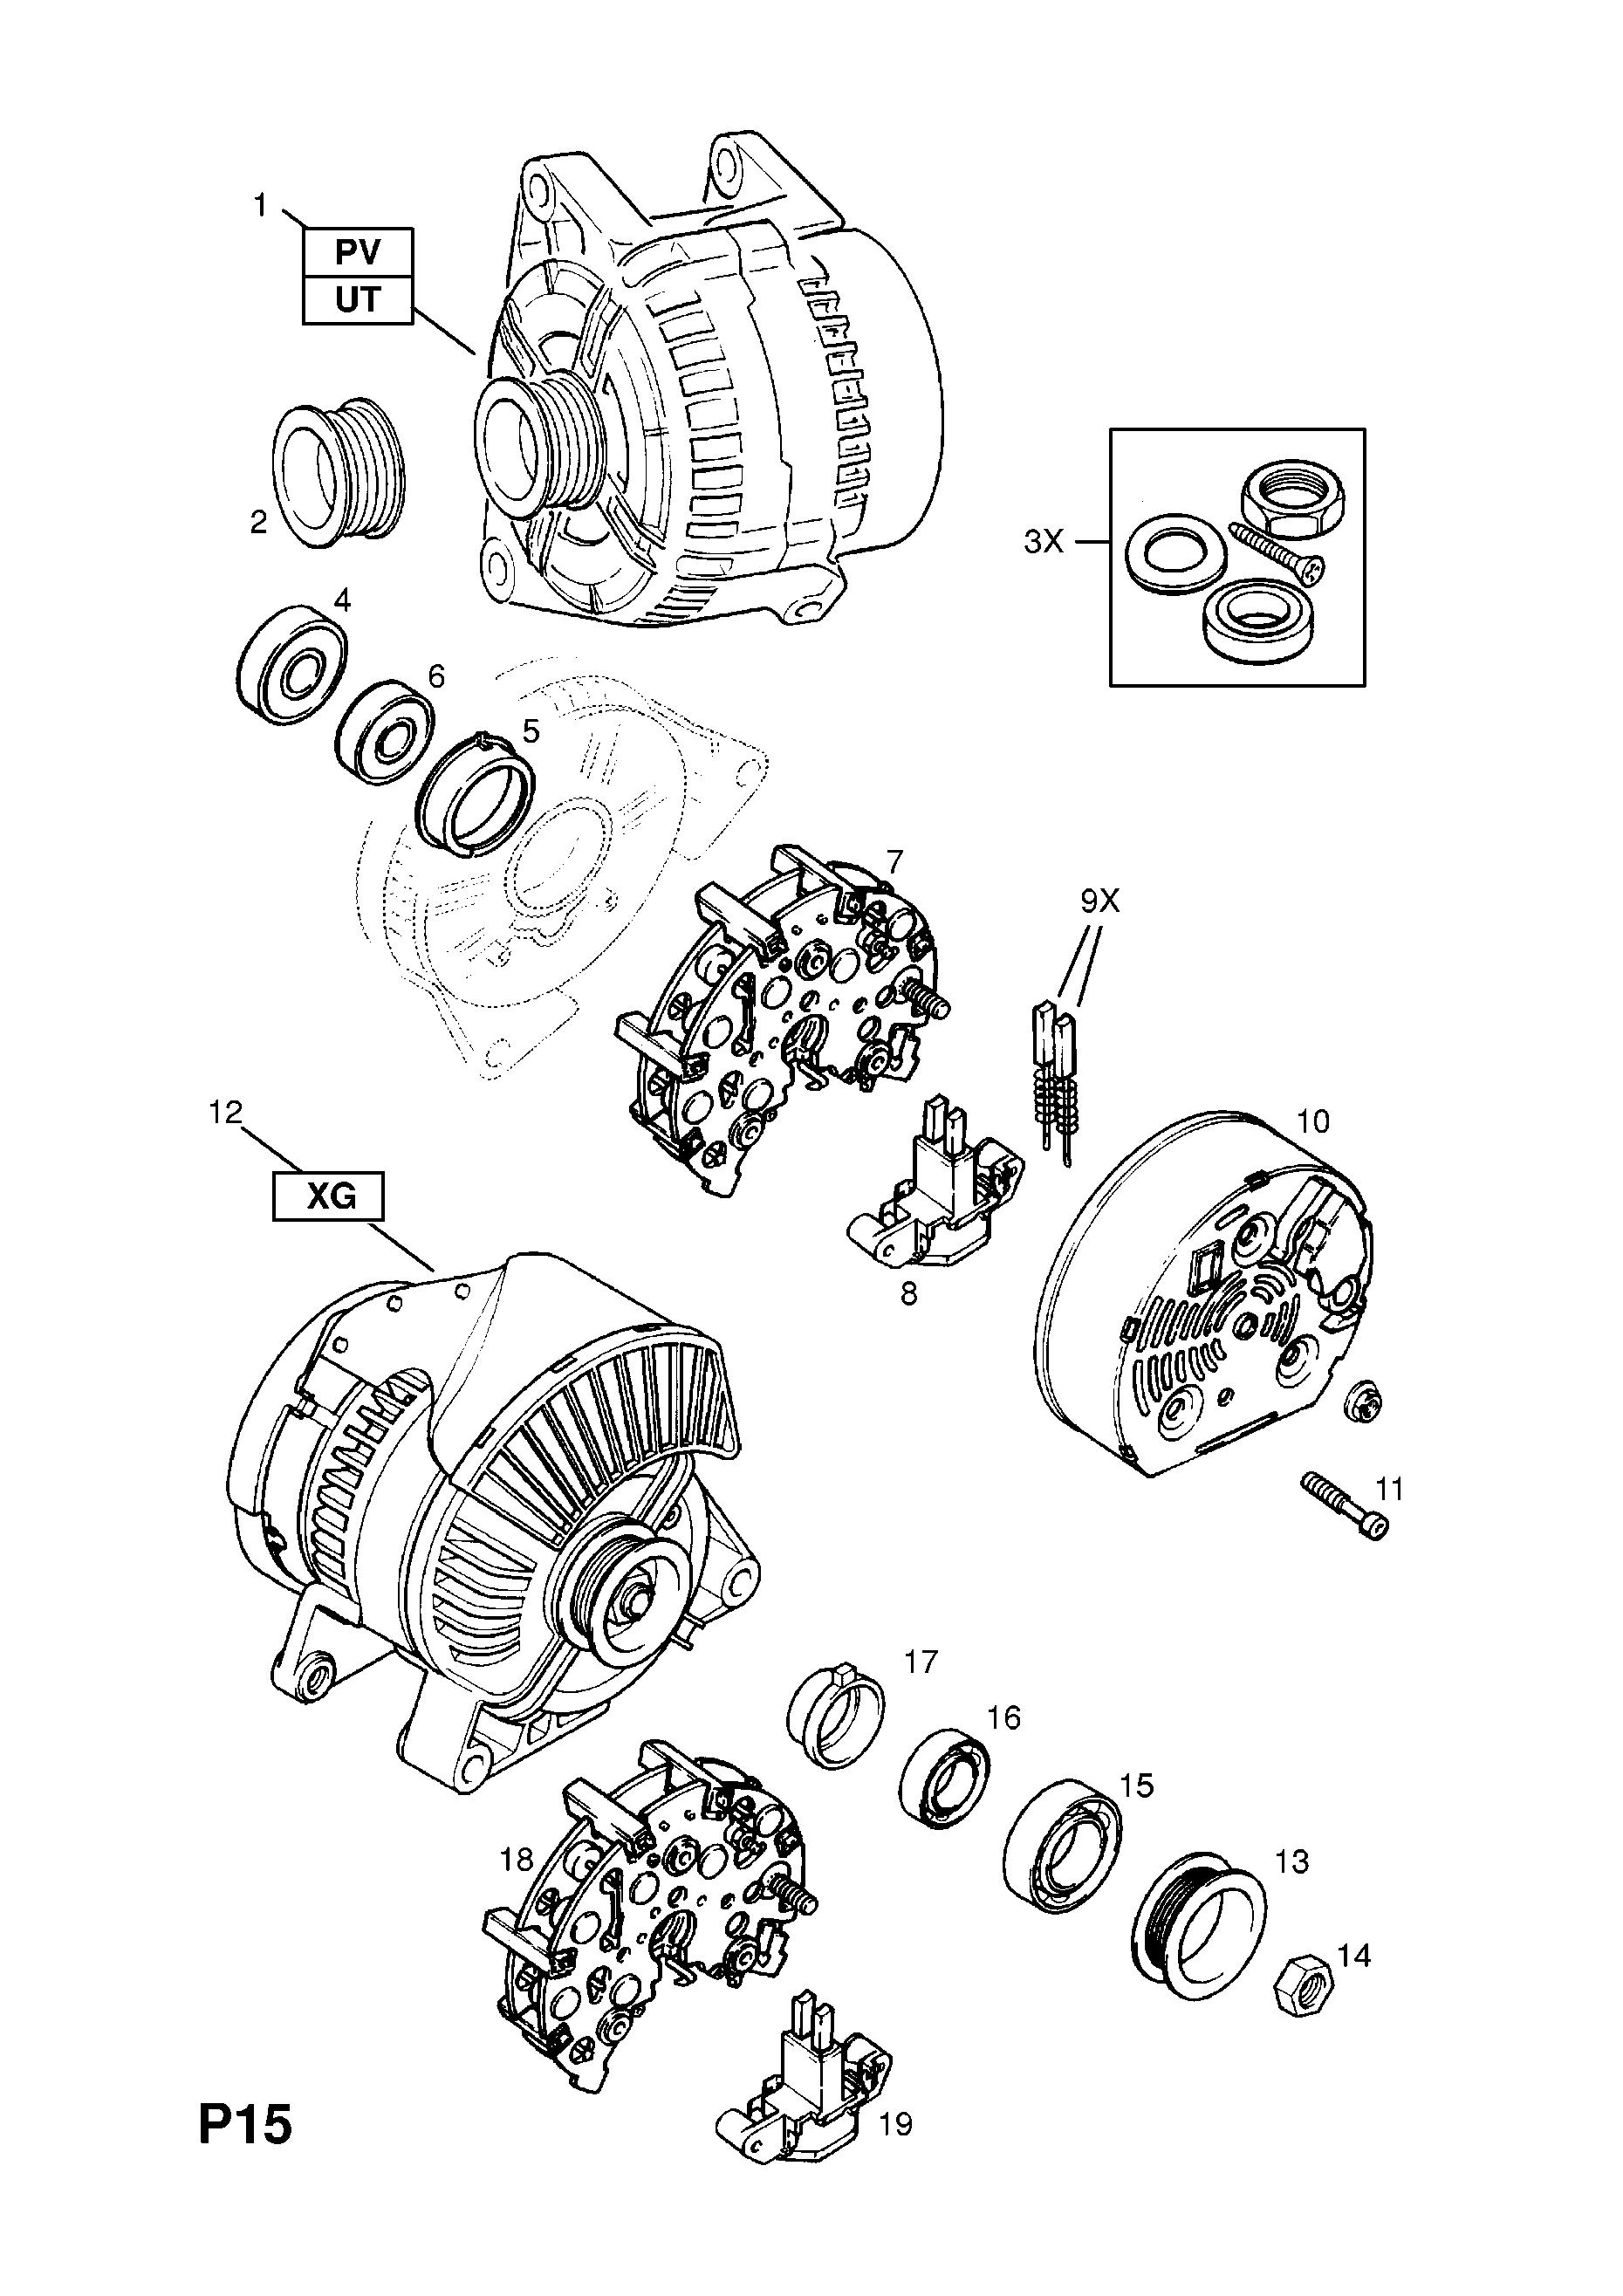 Vauxhall Vectra B 1996 2002 P Electrical 1 Engine And Cooling Gm Alternator Wiring Diagram Part Number Genuine Description Range